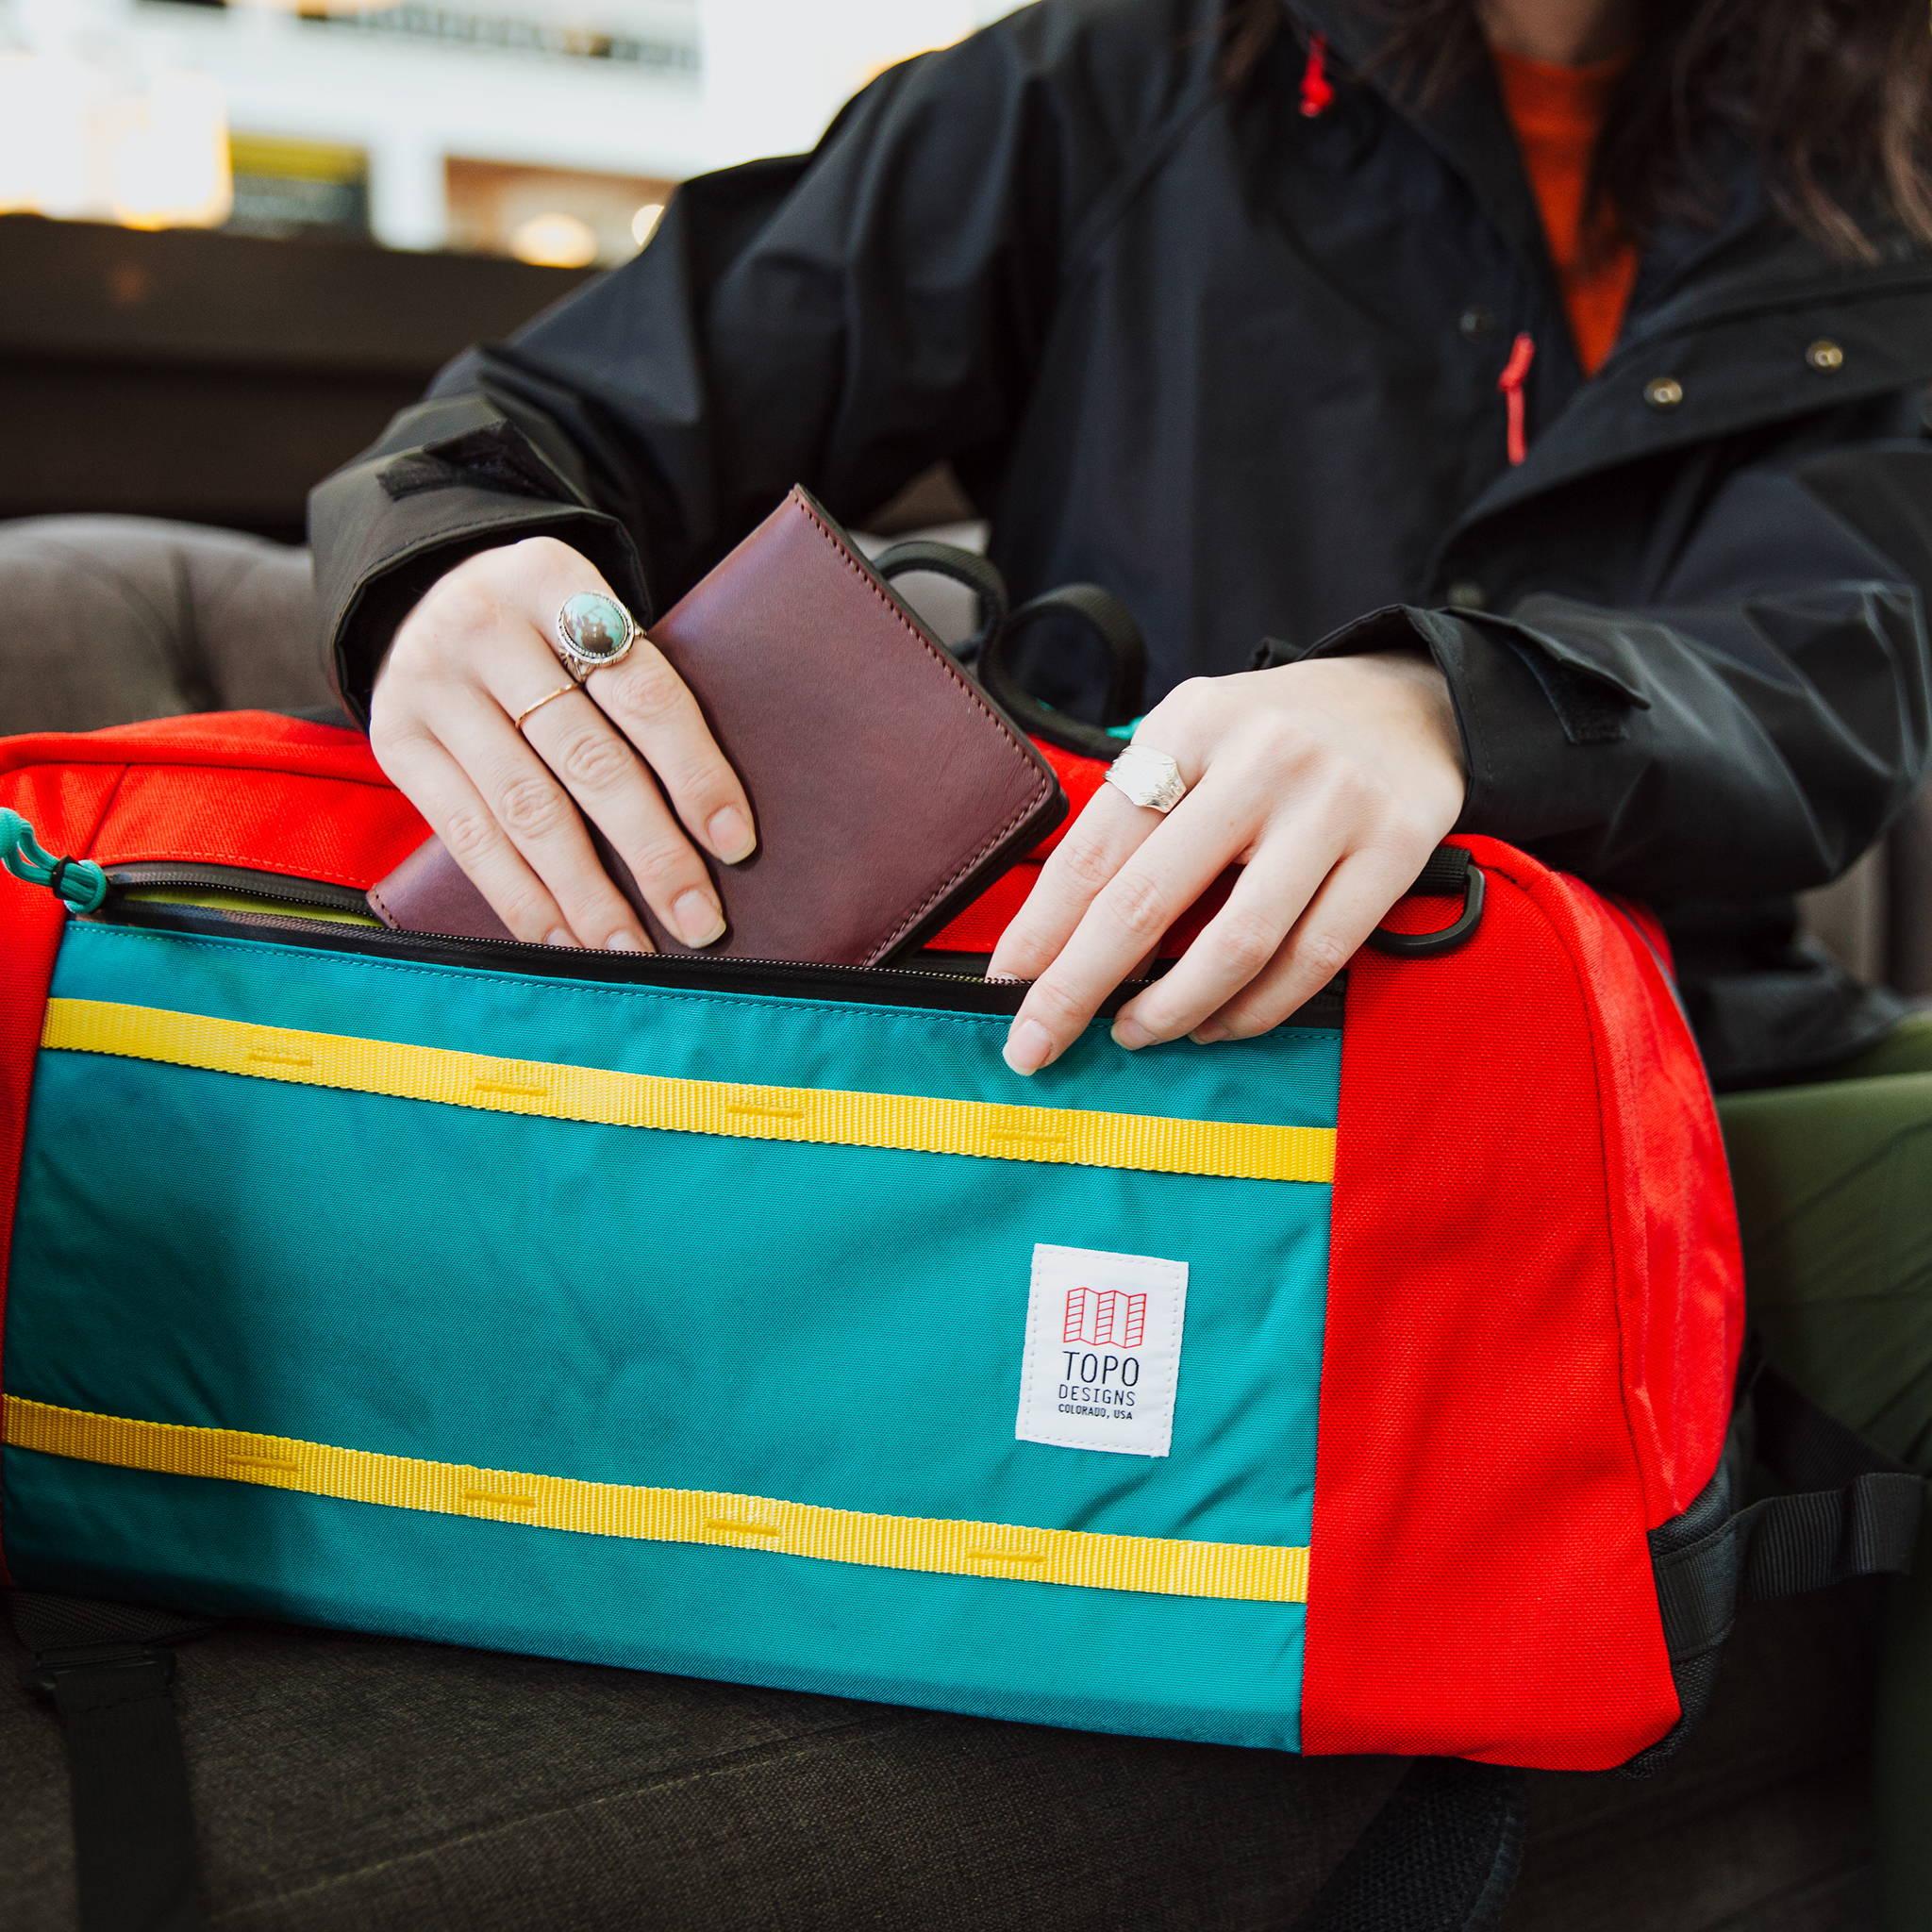 8f548f2e20 40L Travel Duffel Carry On Bag – Topo Designs